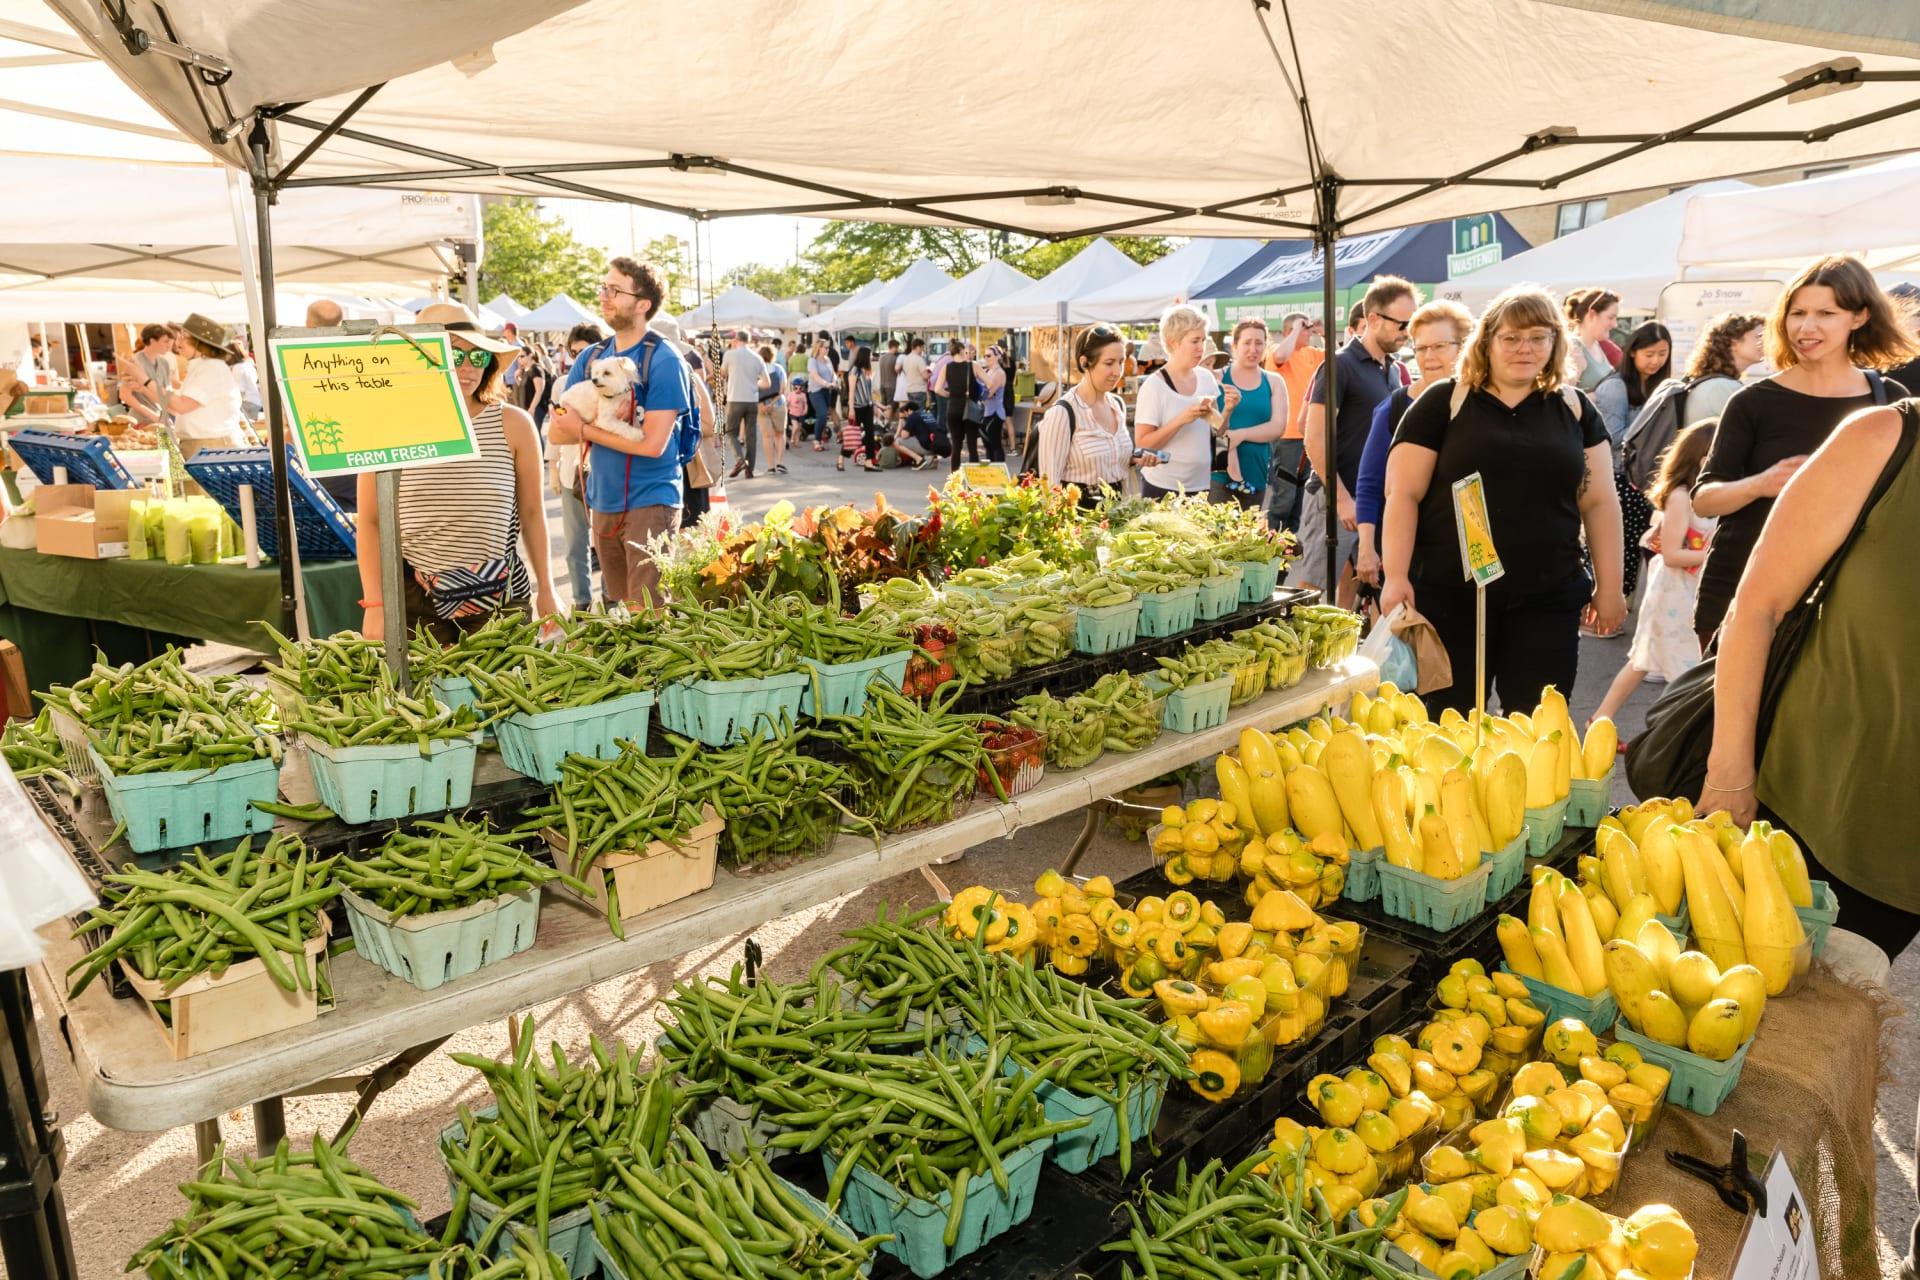 Lincoln Square Faremrs Market Produce